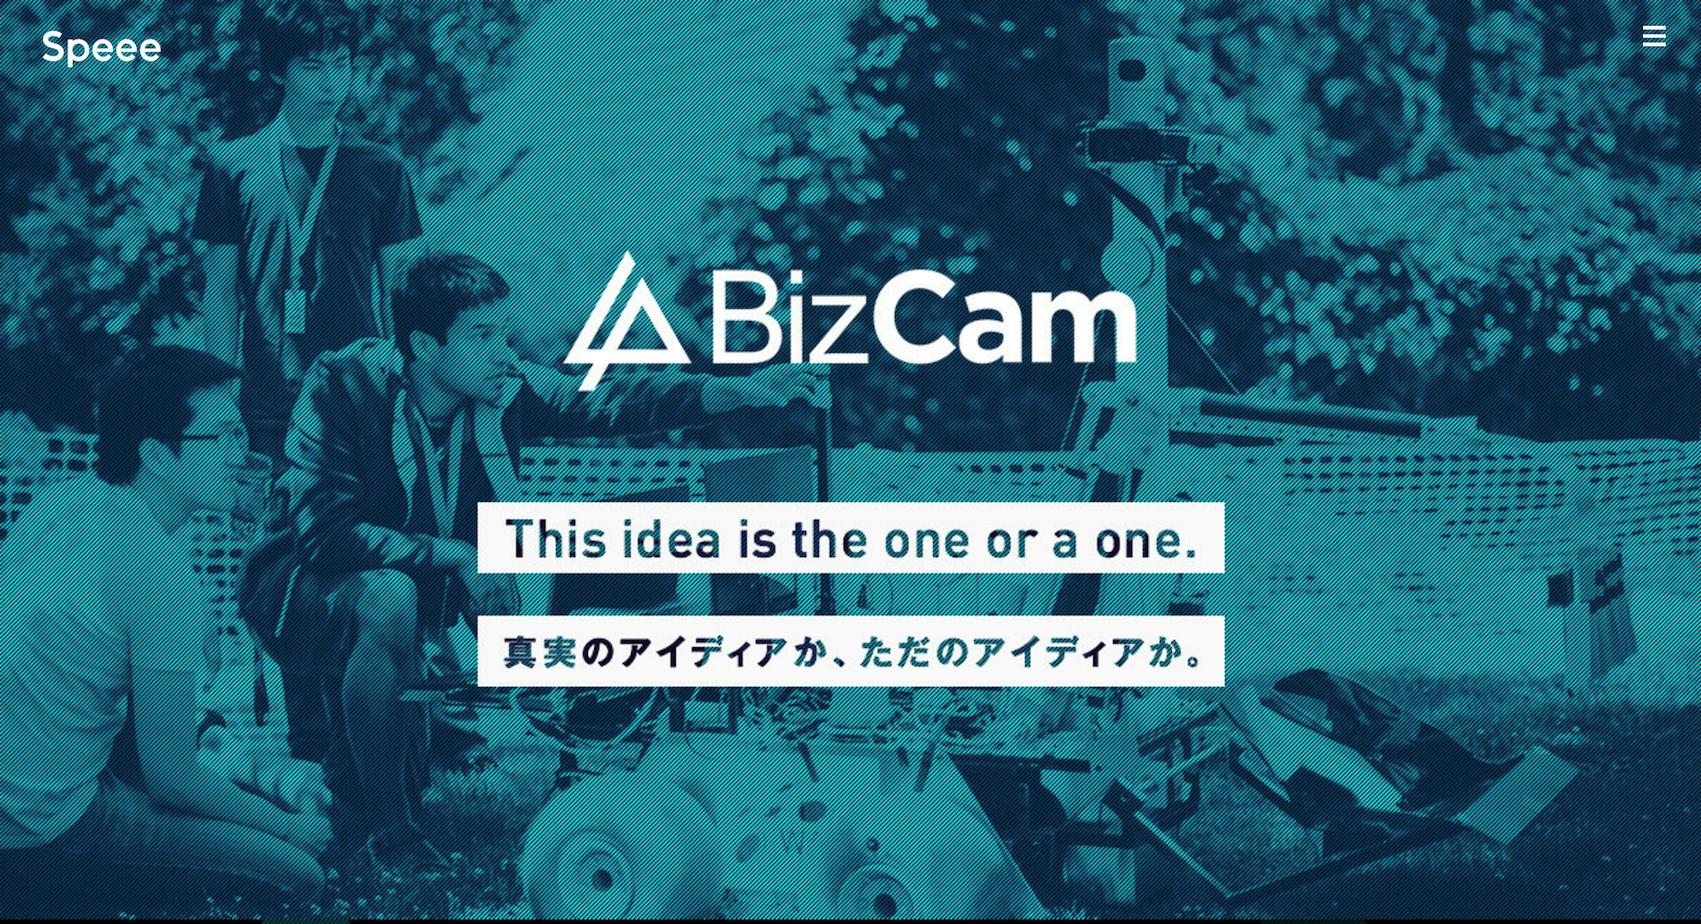 BizCam___Speee_新卒対象_新規事業立案インターン.png